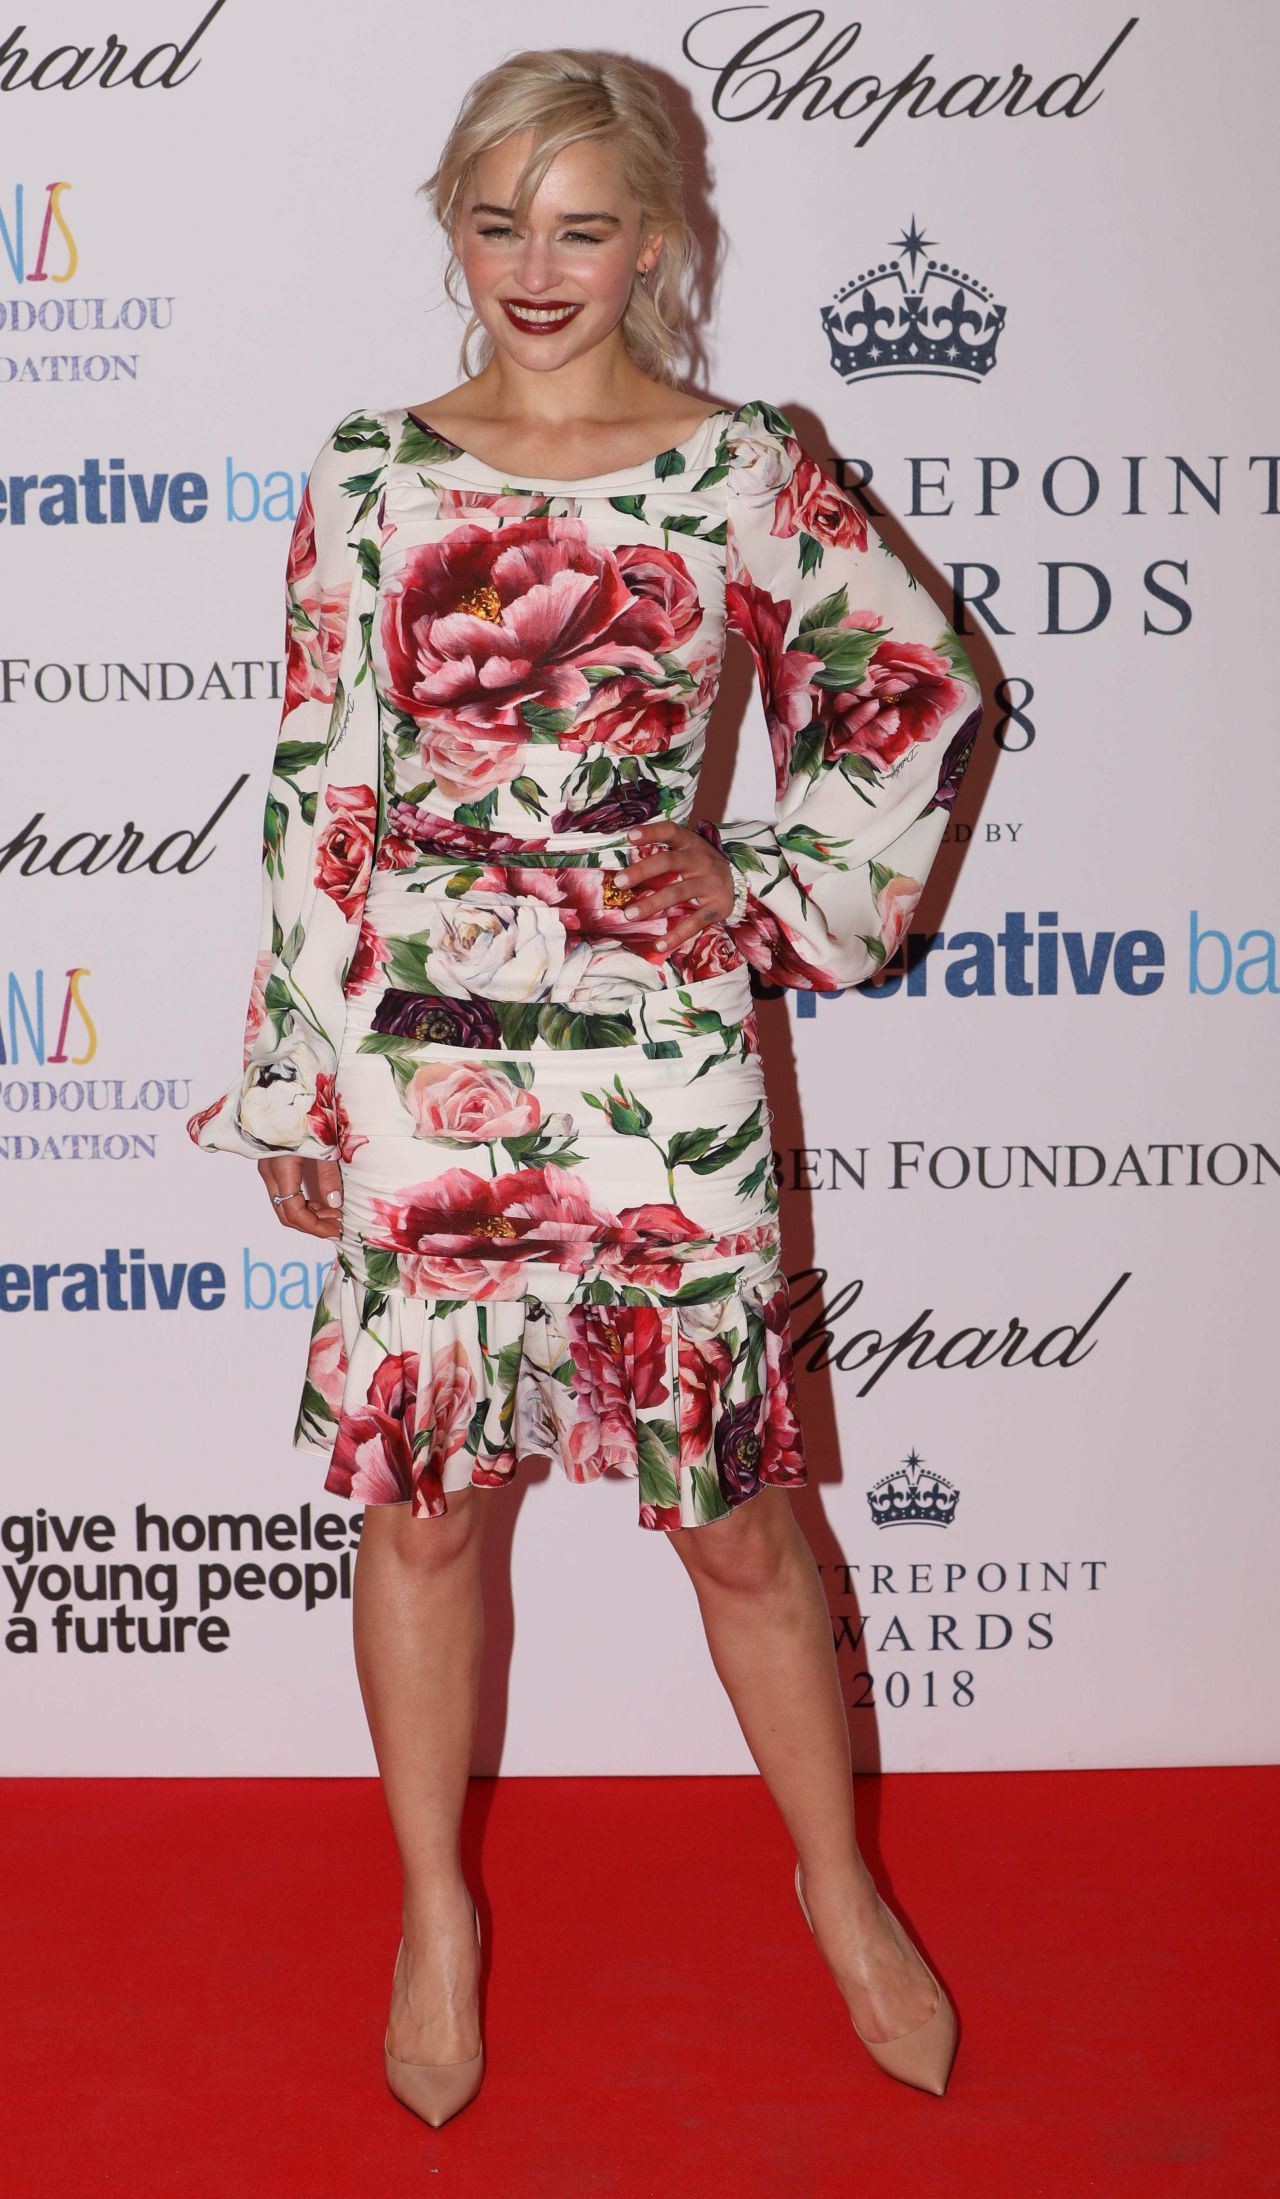 Emilia Clarke 2018 Centrepoint Awards In London